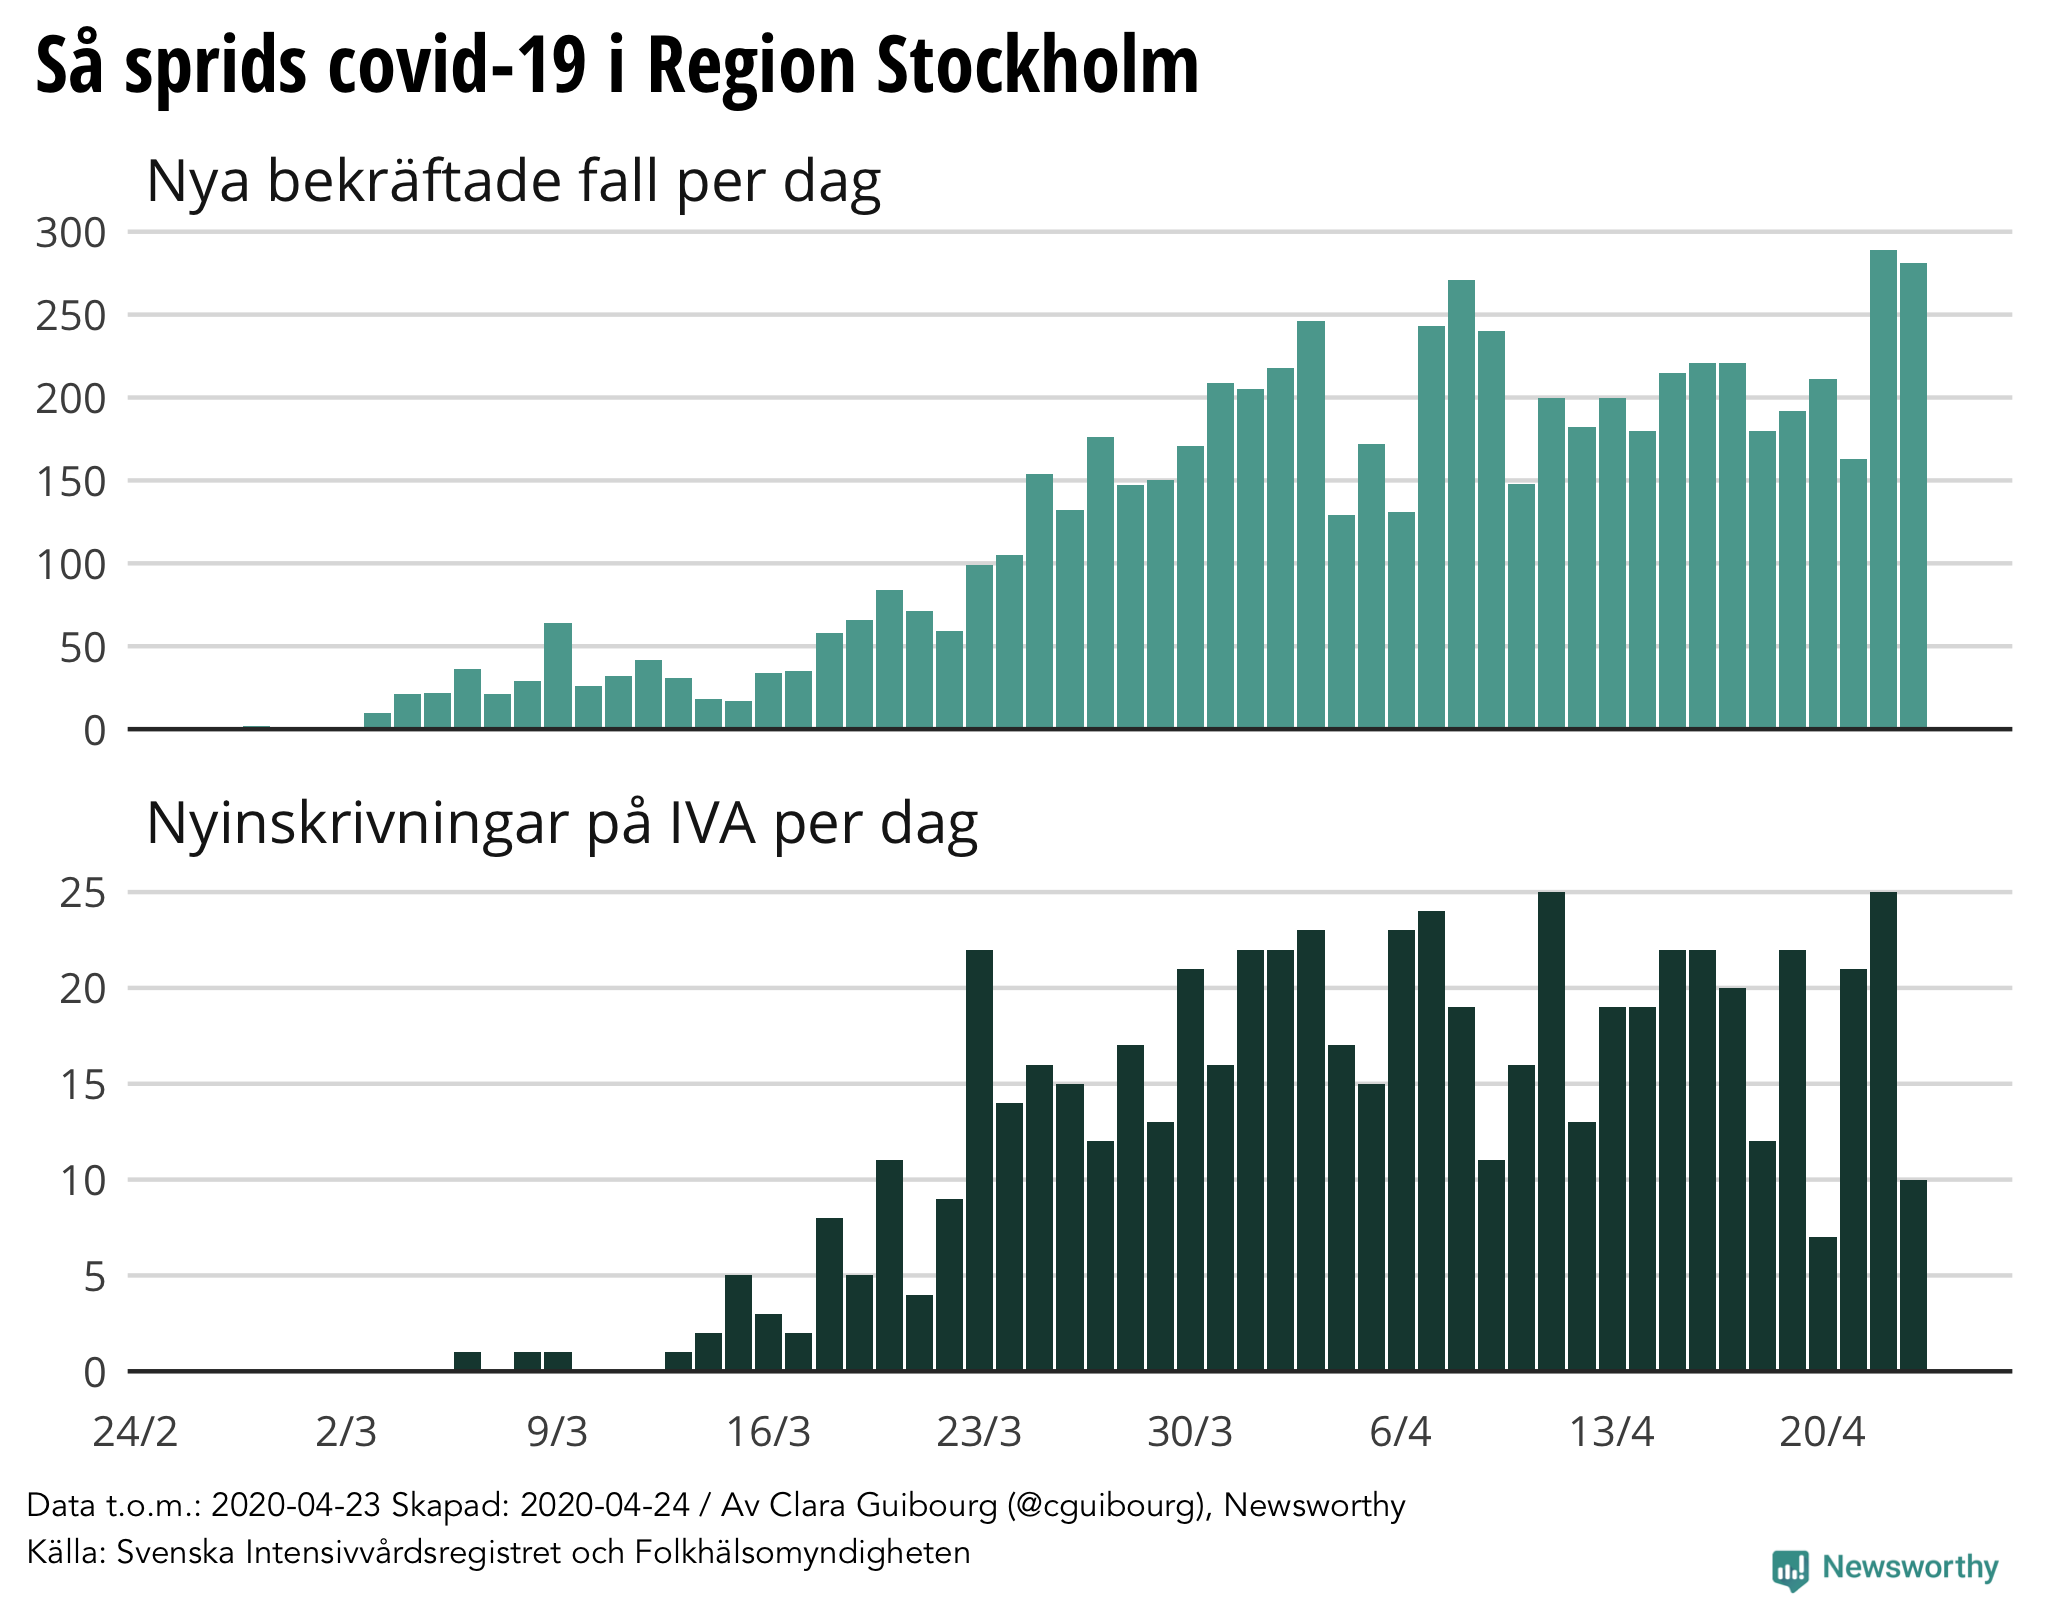 Newsworthy Corona Rapport Region Stockholm 24 April